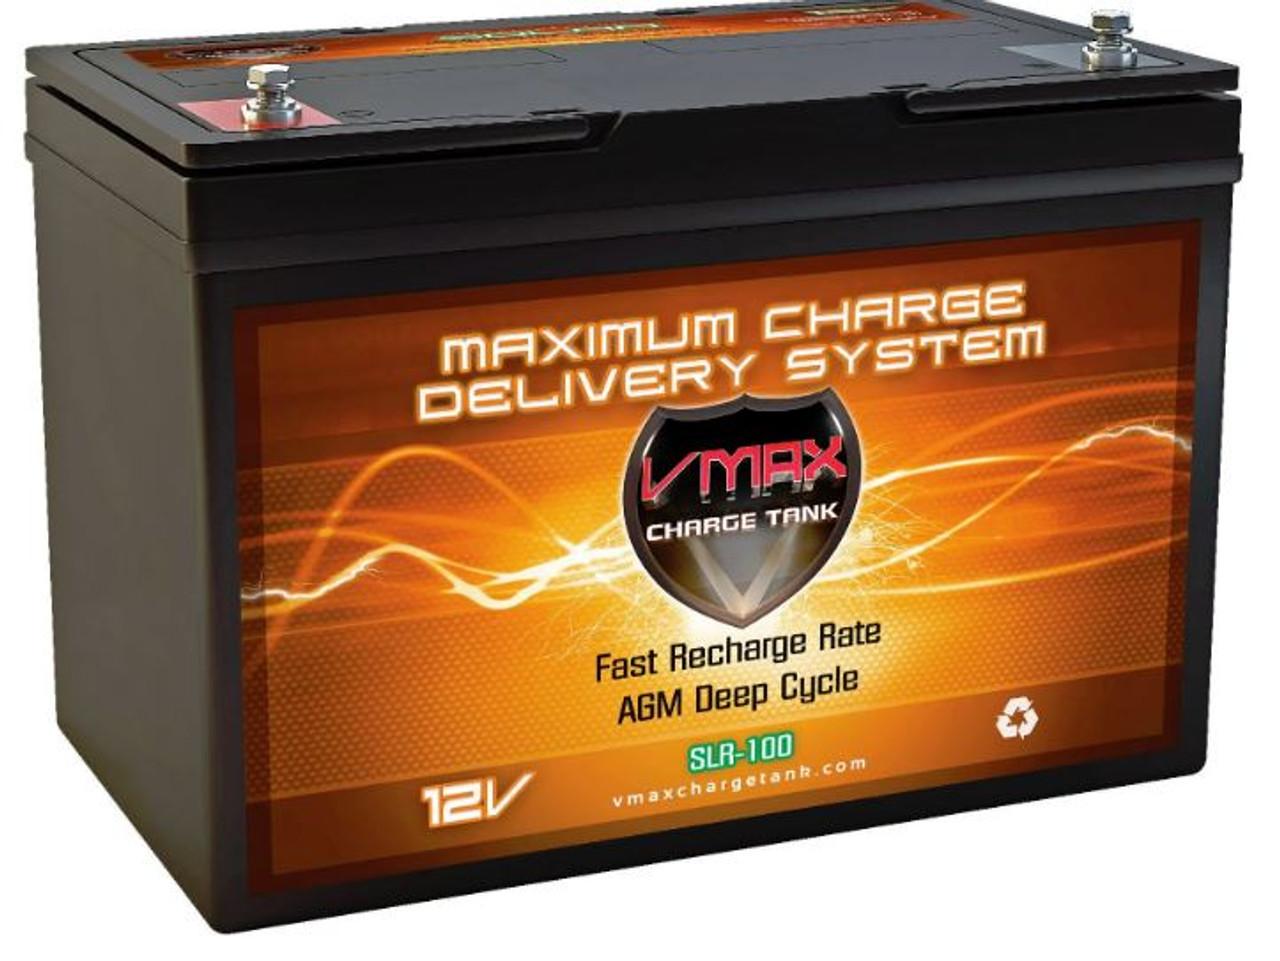 VMAX Charge Tank SLR100, 100AH Deep Cycle AGM Solar Battery